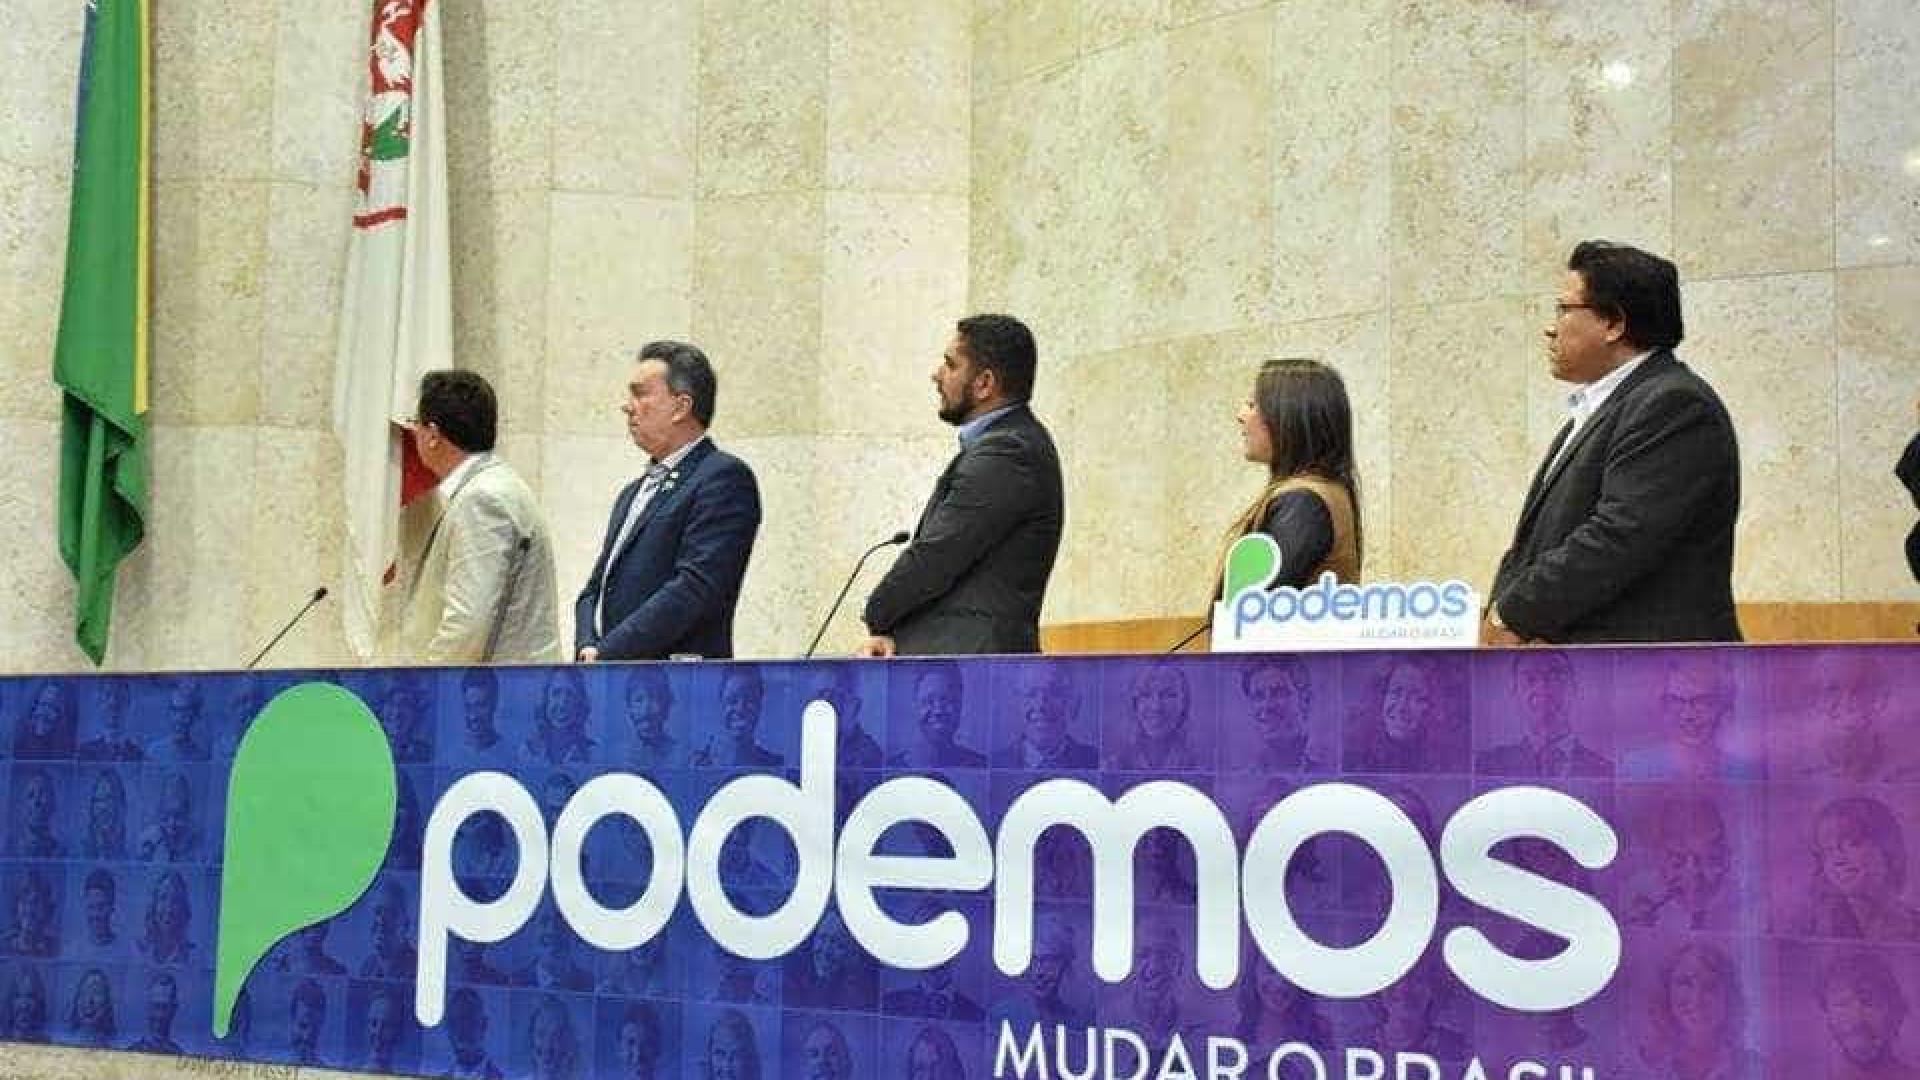 'Sigla da Lava Jato', Podemos vira alvo dos bolsonaristas